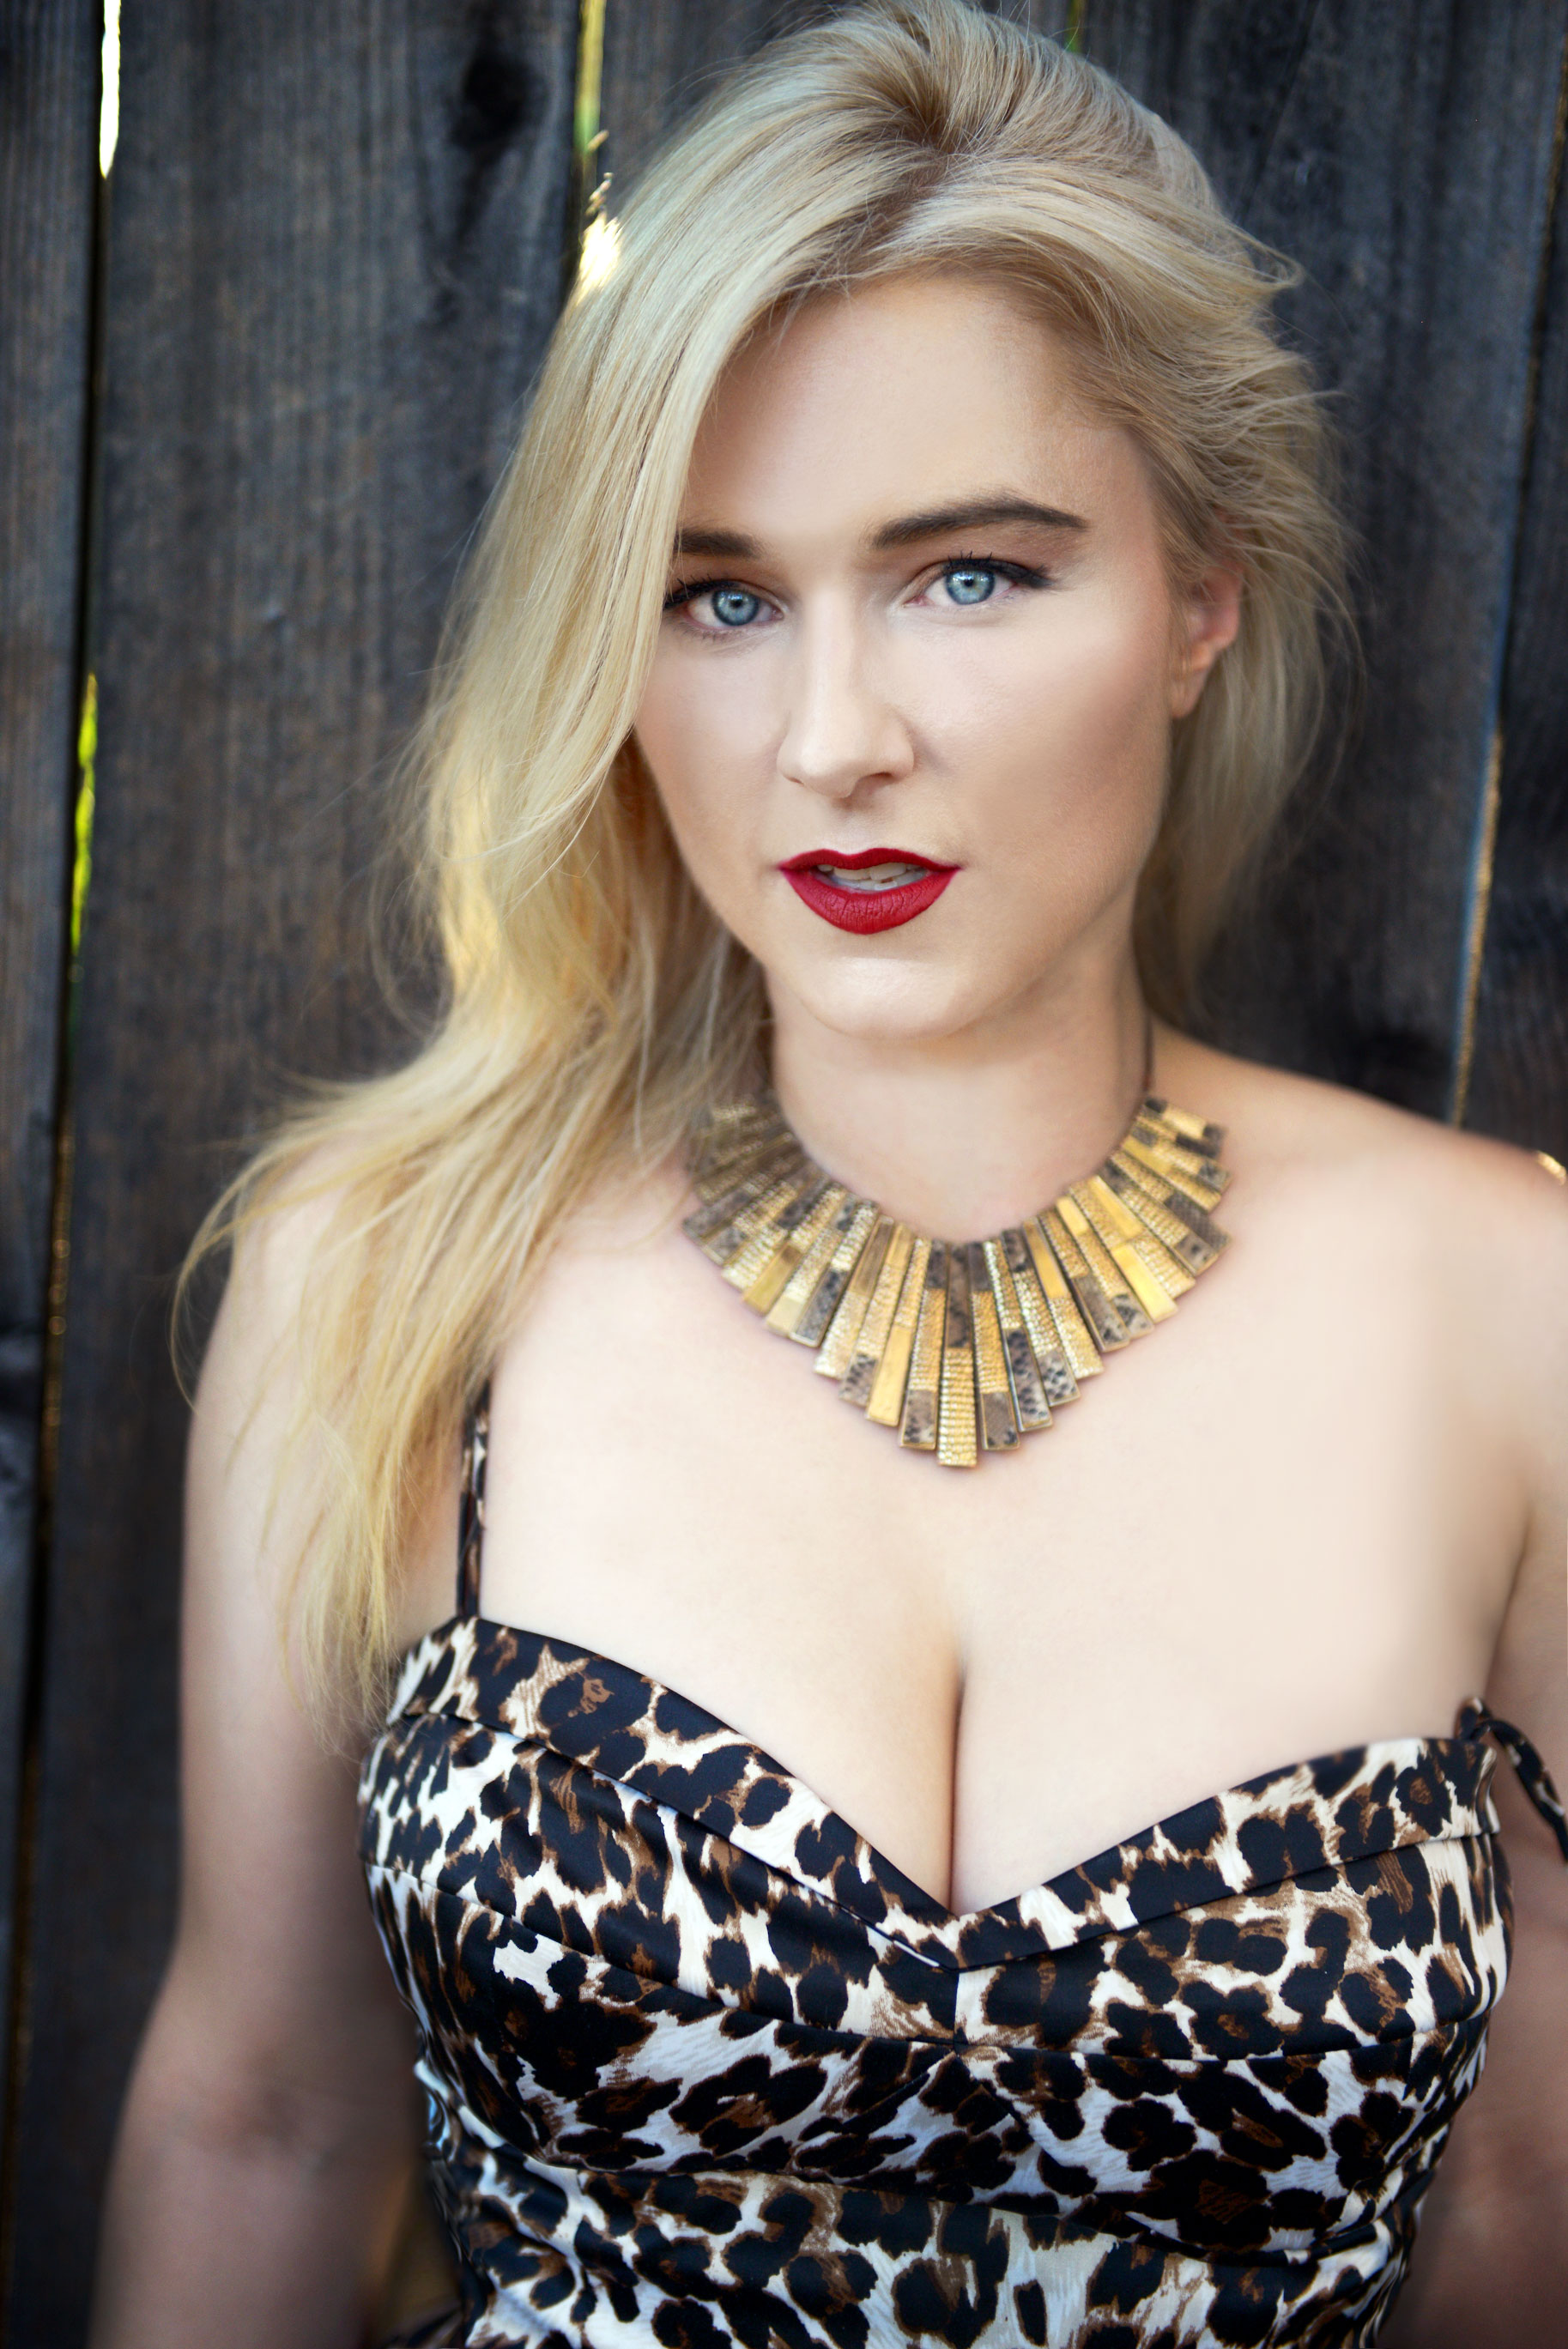 Natalie Victoria